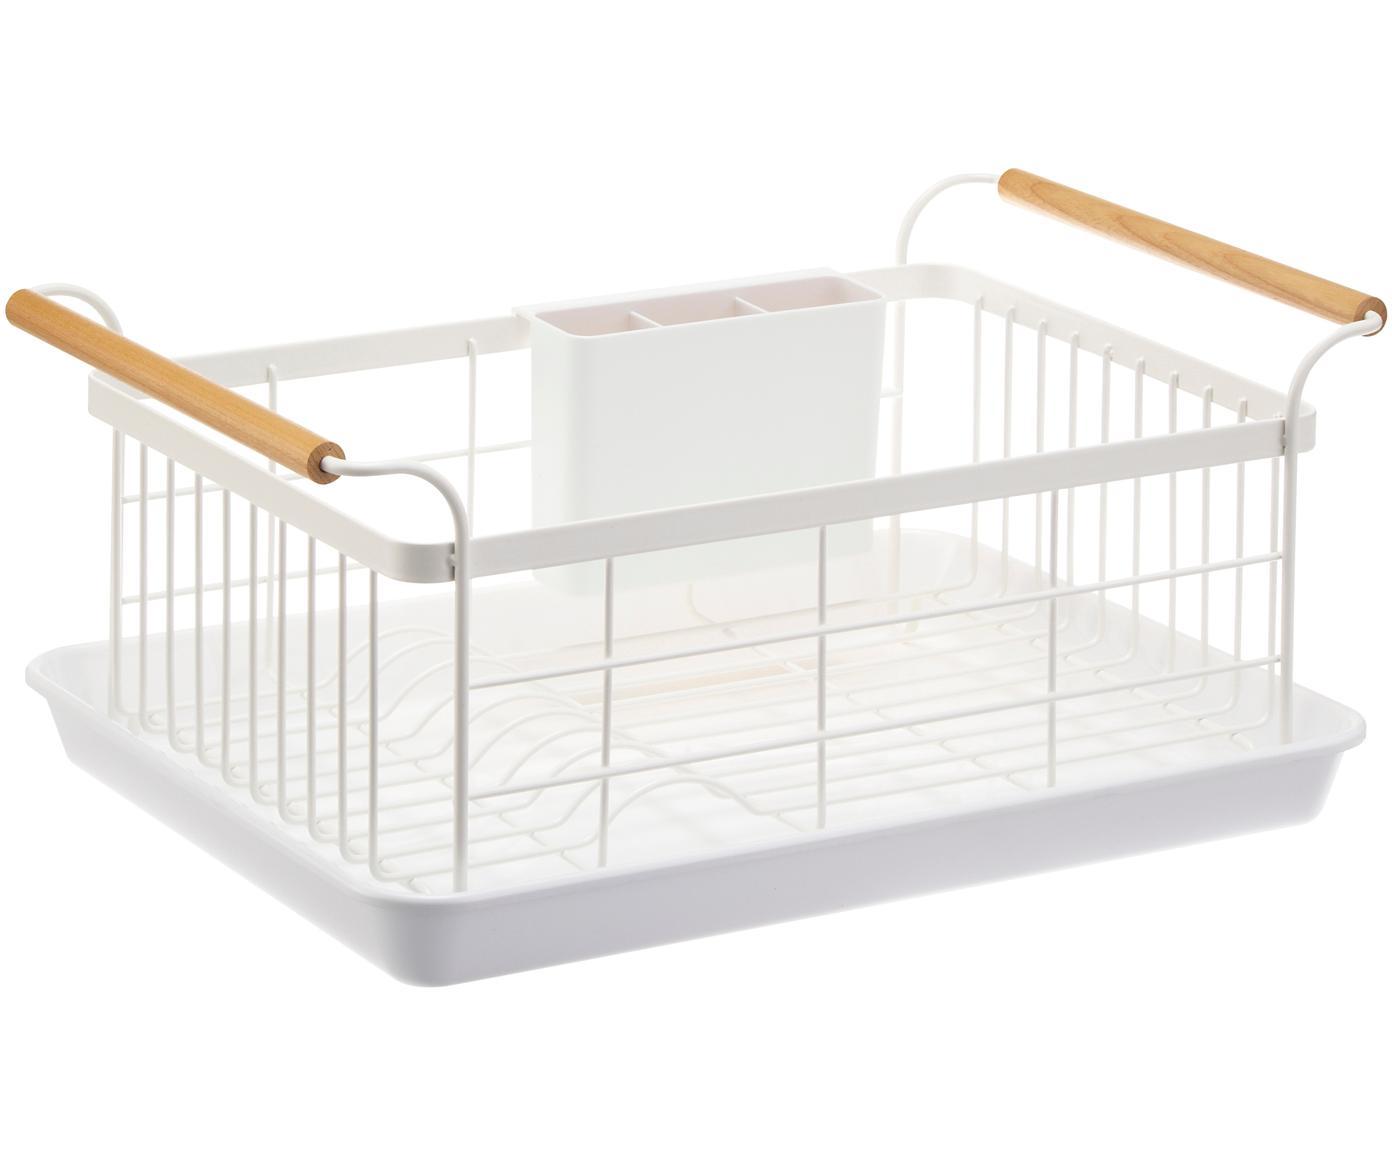 Abtropfgestell Tosca, Korb: Stahl, beschichtet, Griffe: Holz, Weiß, Holz, 47 x 20 cm